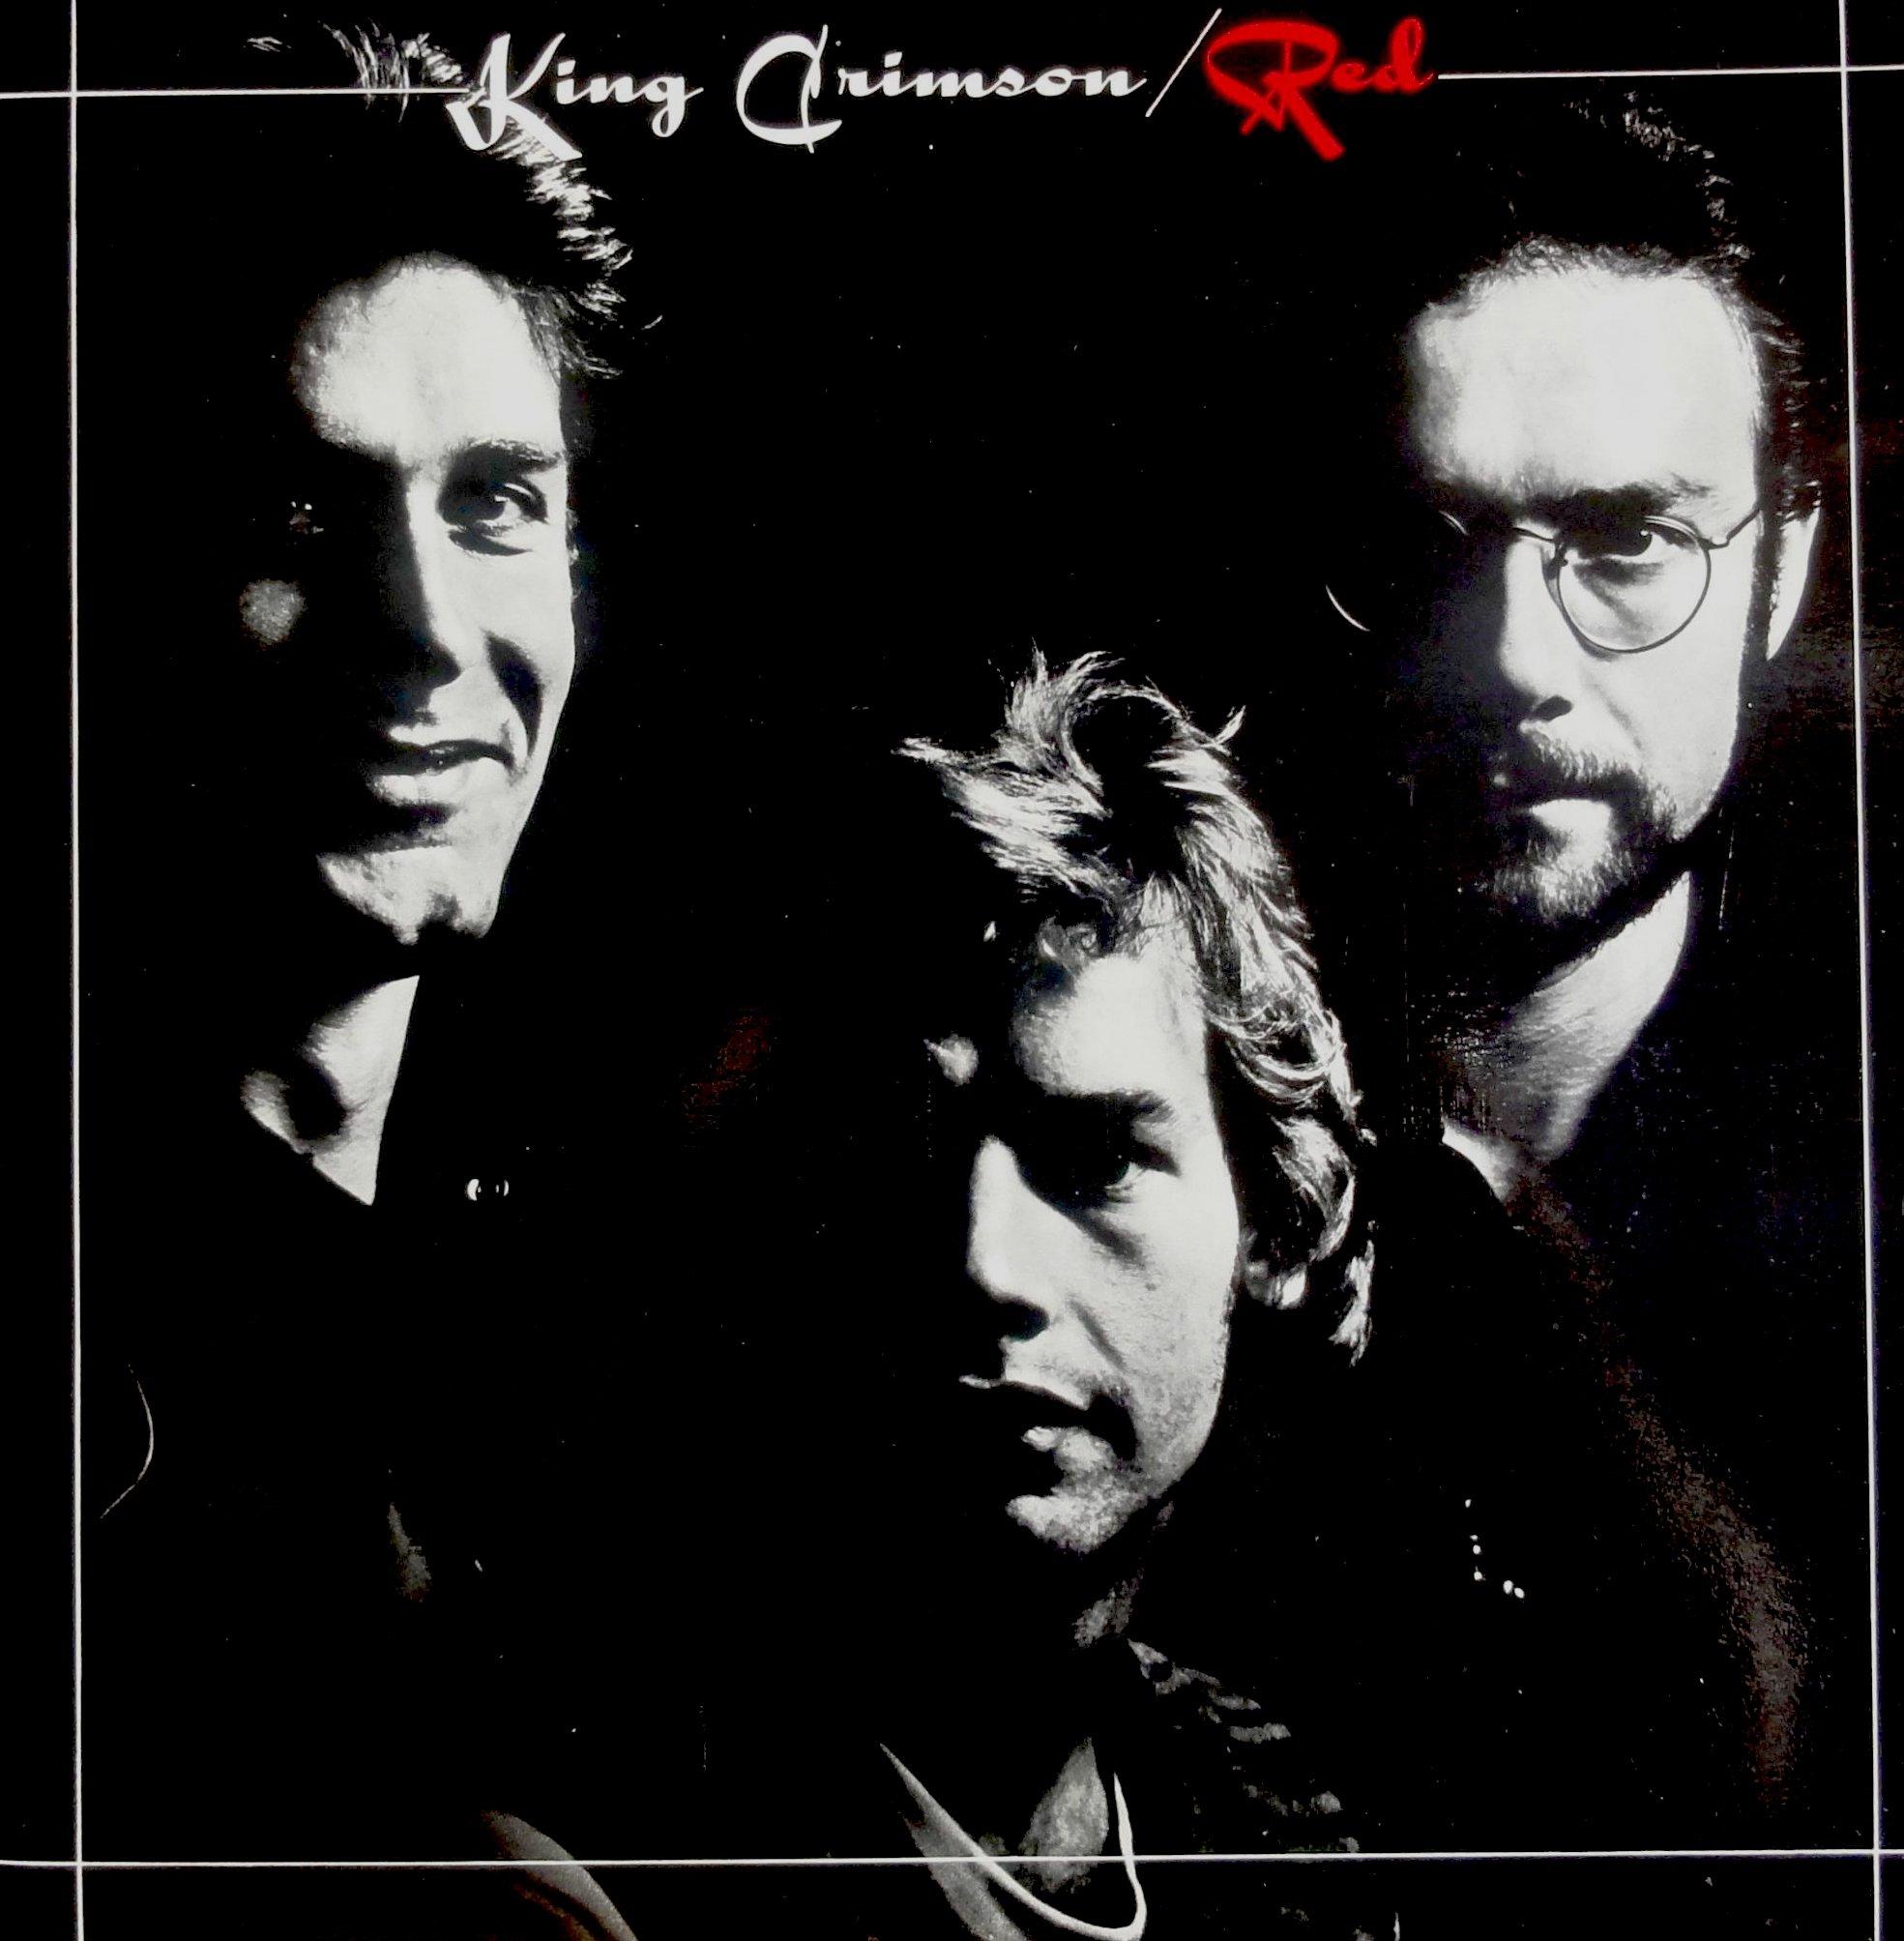 RED – King Crimson (1974)